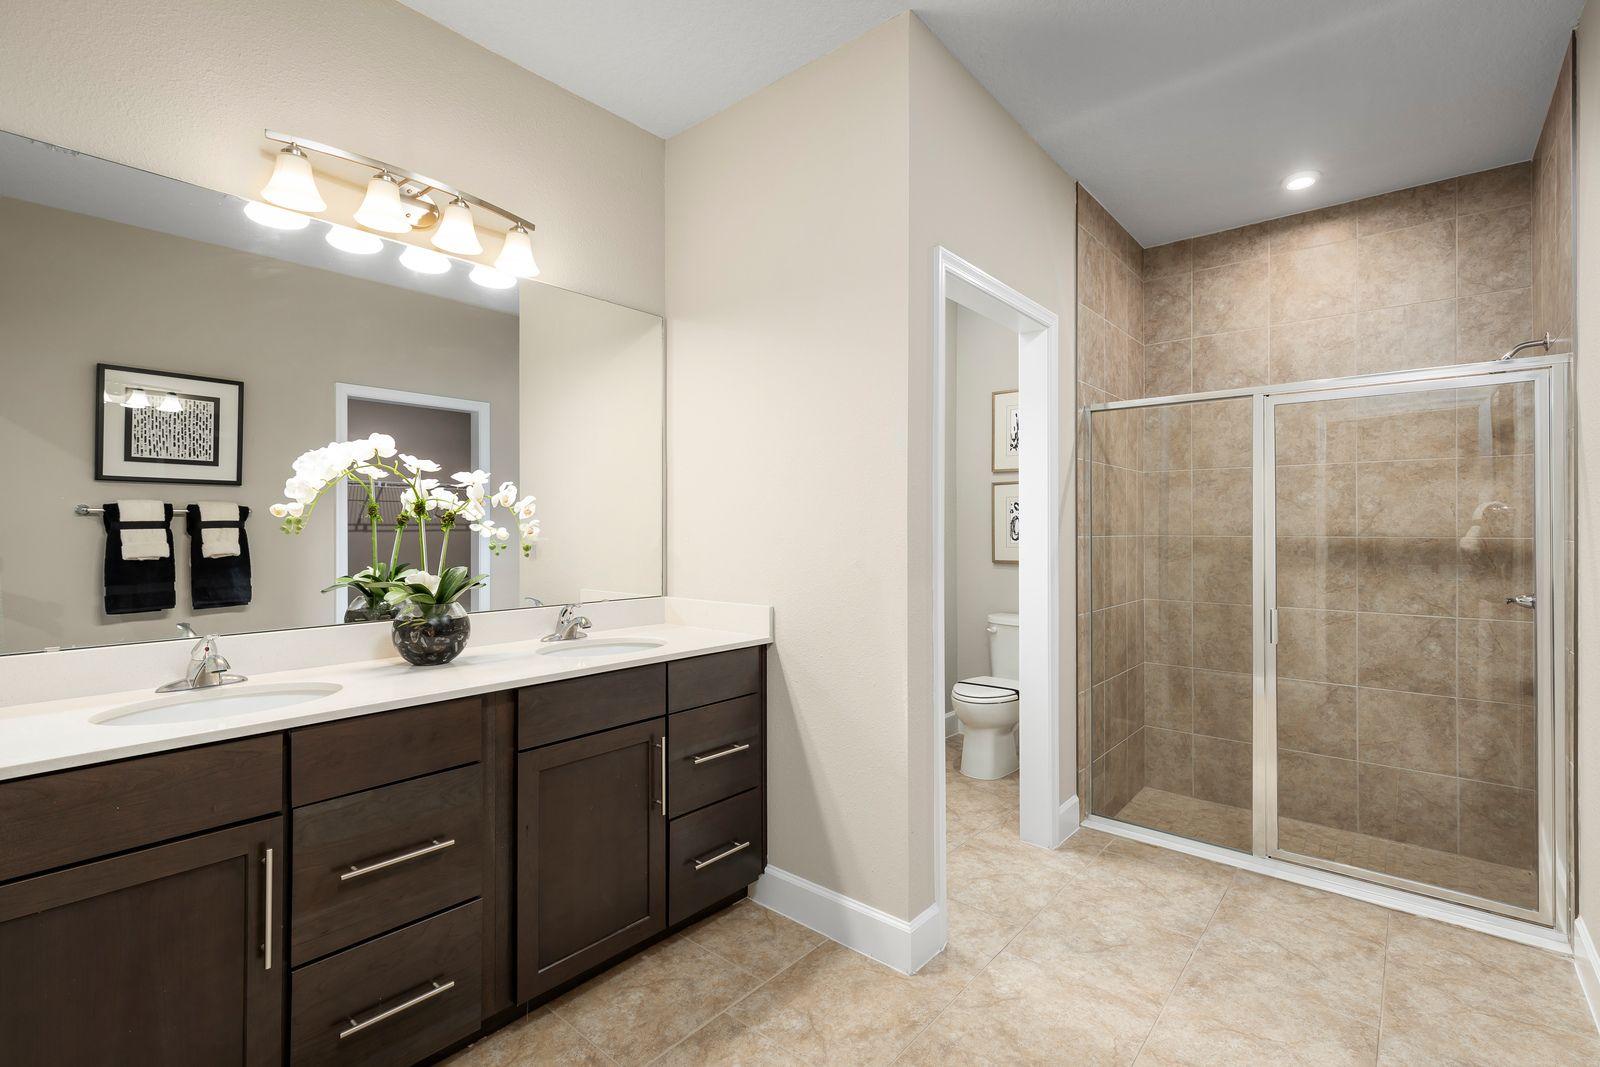 Bathroom featured in the Adeline By Ryan Homes in Sarasota-Bradenton, FL